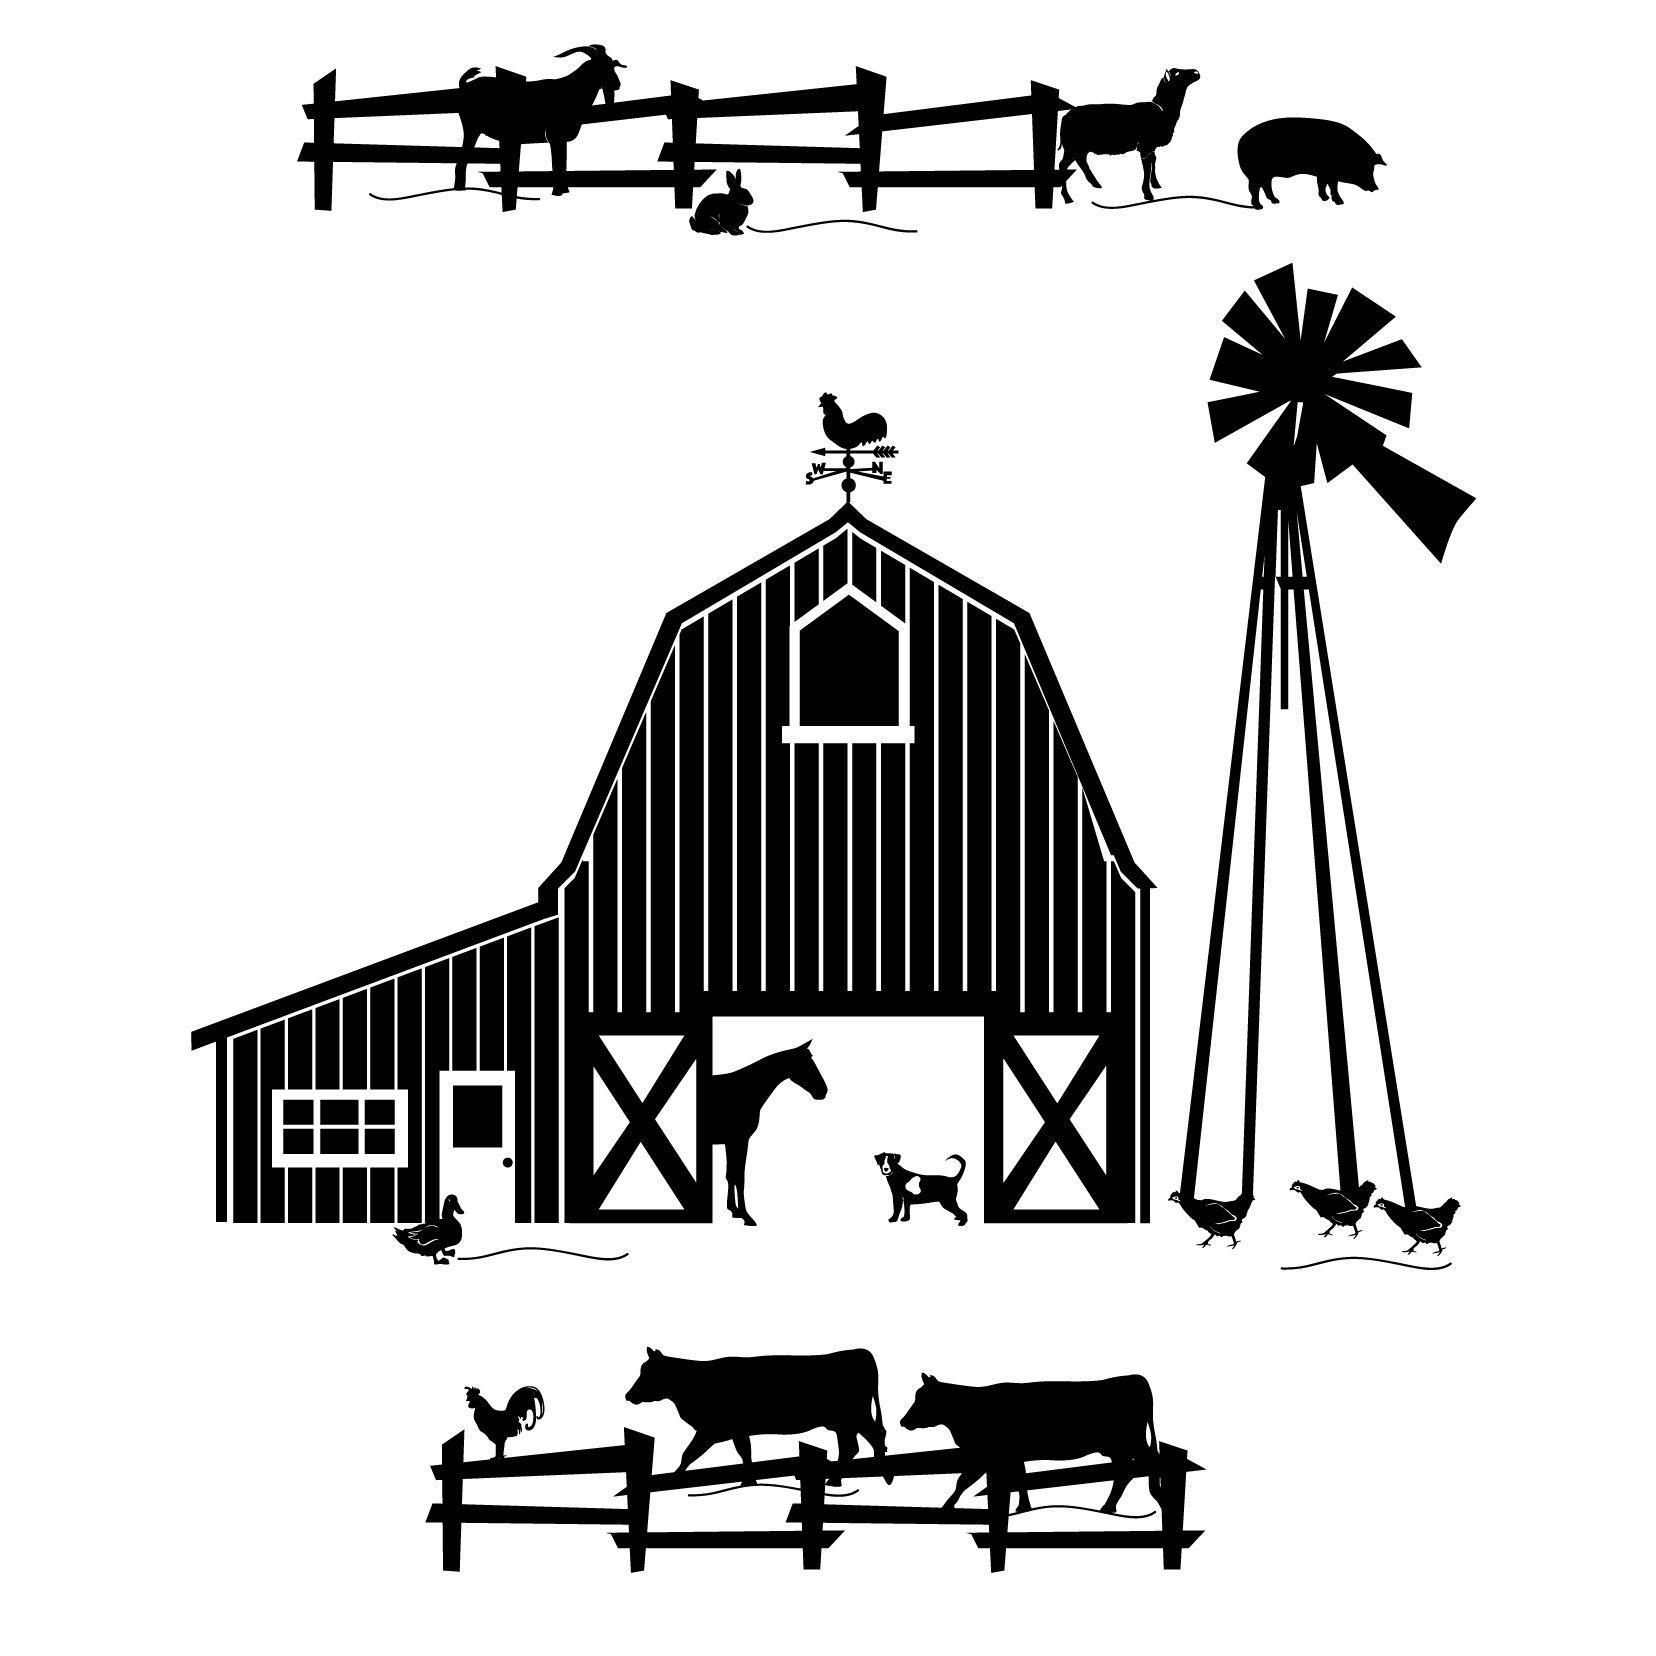 Farm scene google search. Agriculture clipart black and white